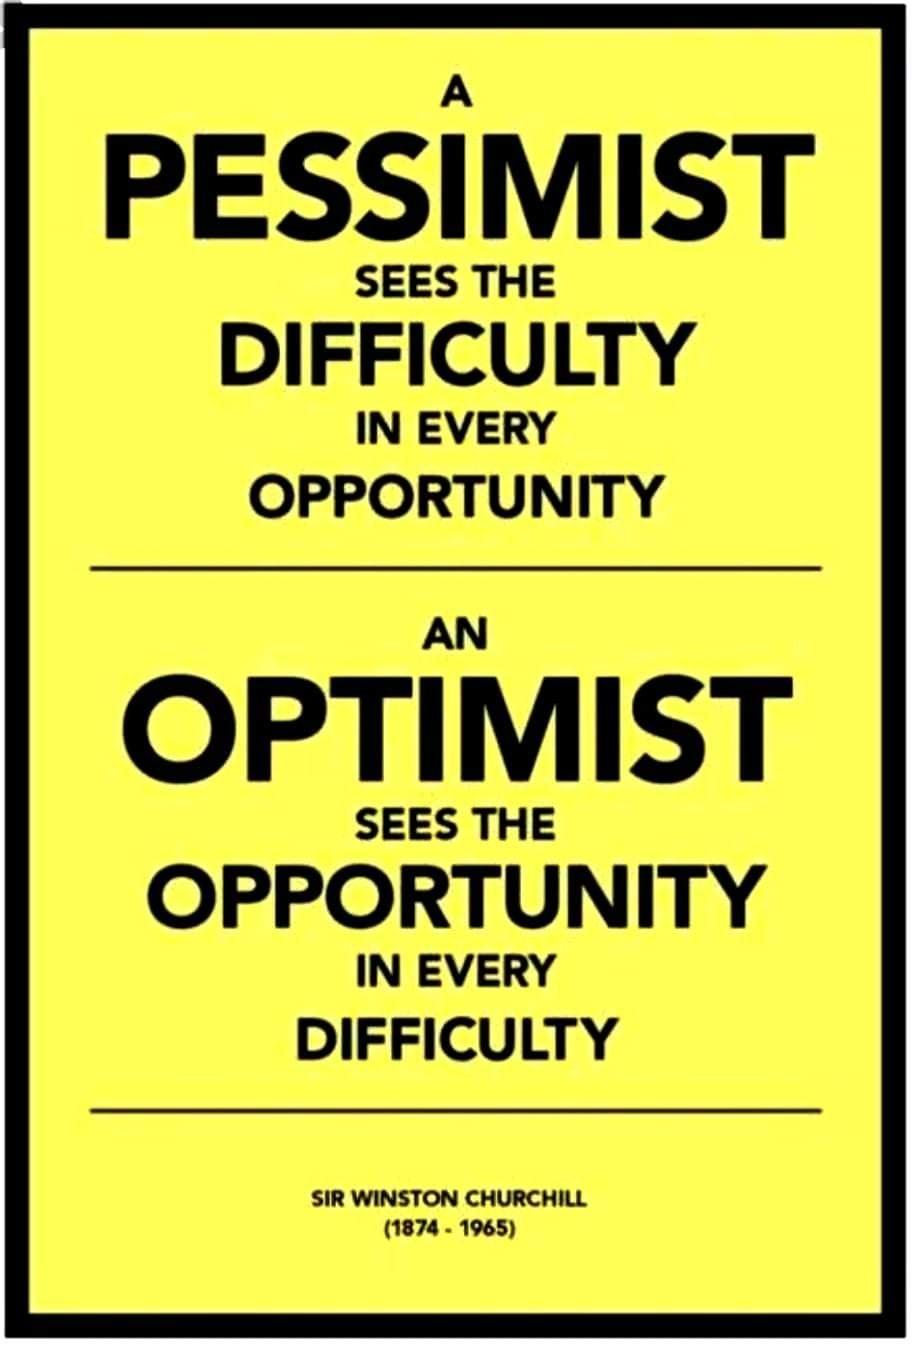 6afd0f9a3bd657483041295e169afc0f - Optimist vs Pessimist - Tira-Pasagad | Saksak-Sinagol